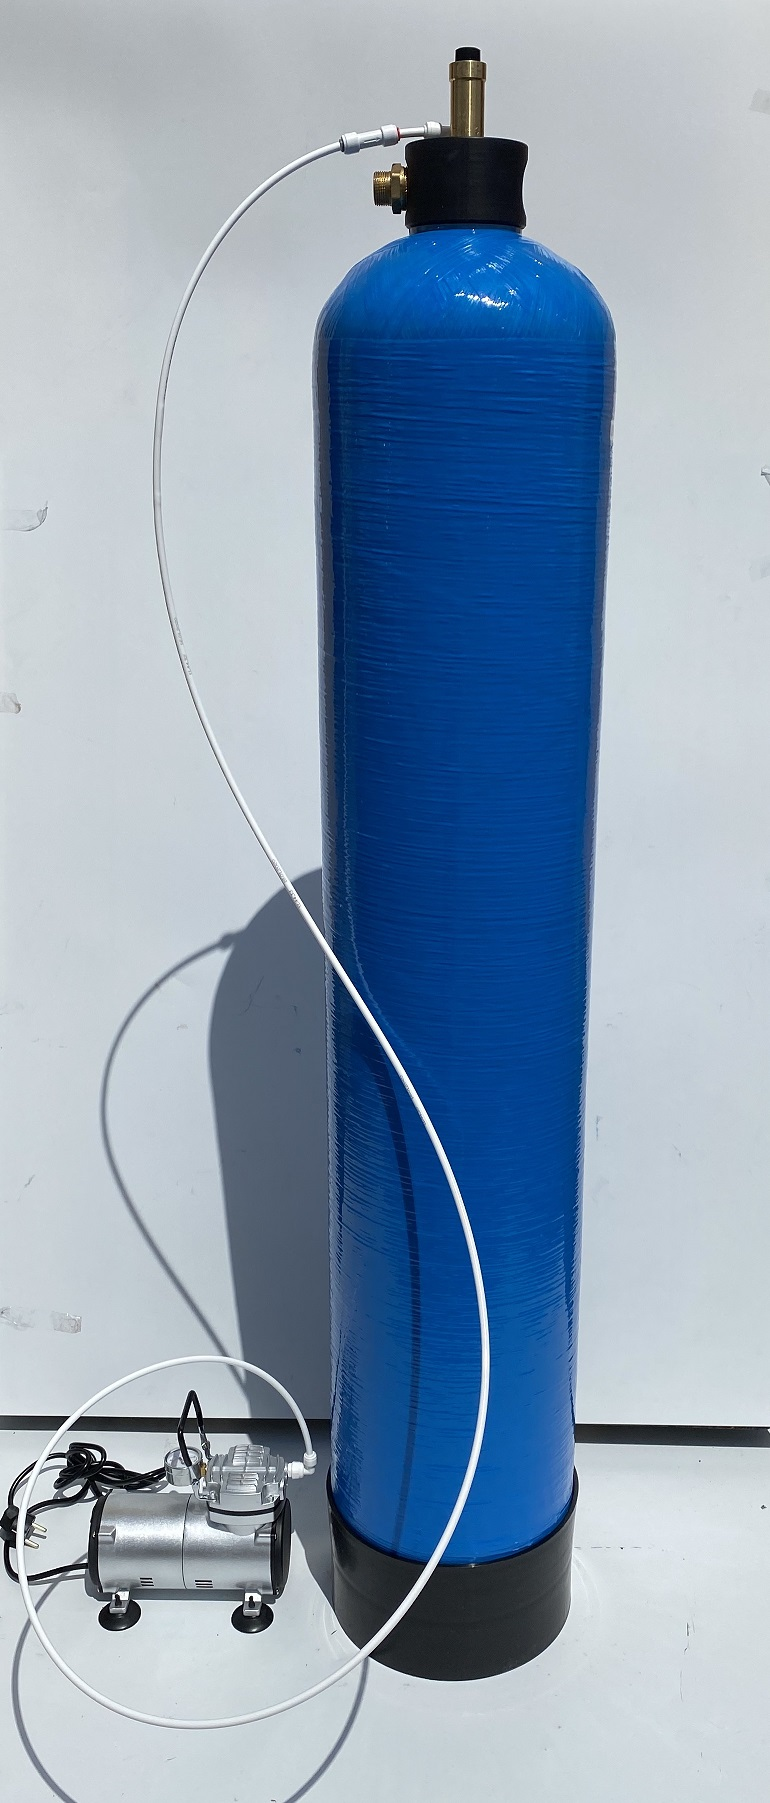 kvapo-valymo-filtras1.jpg